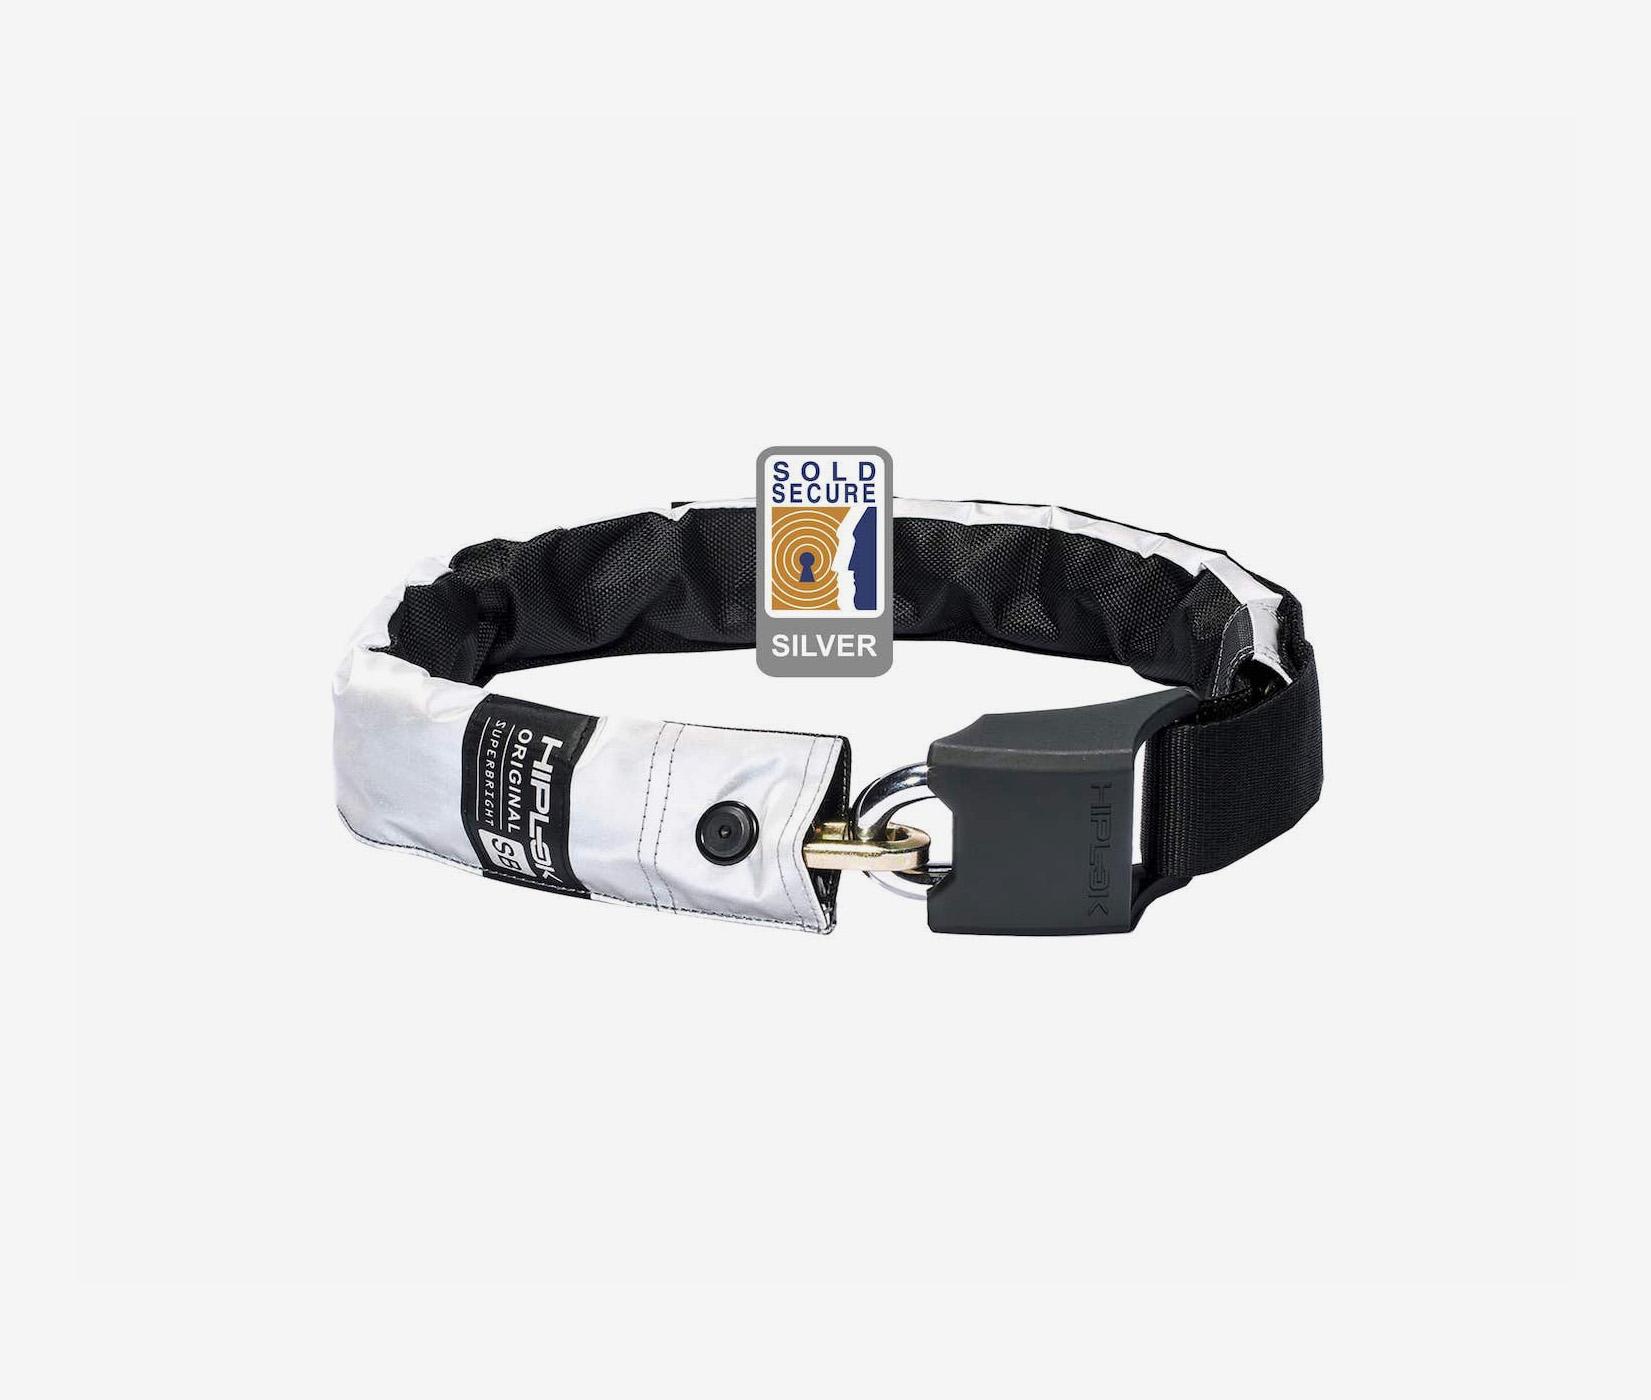 Hiplok original wearable chain lock bike lock sold secure superbright